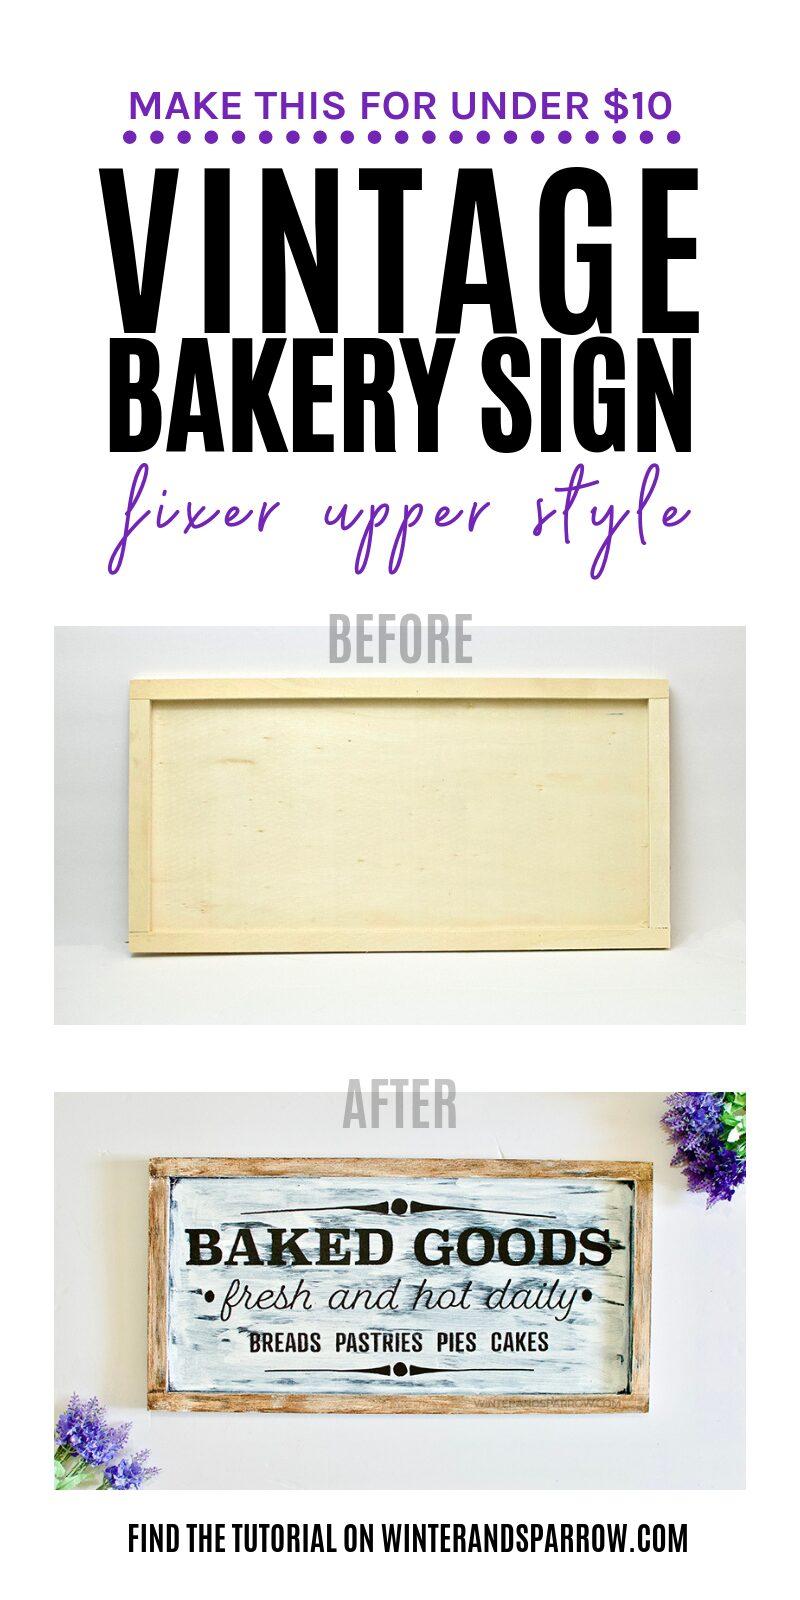 Make It For Under $10: Vintage Bakery Sign Fixer Upper Style [VIDEO]   winterandsparrow.com #vintagebakerysignfixerupper #vintagebakerysign #farmhousesigns #bakedgoodssign